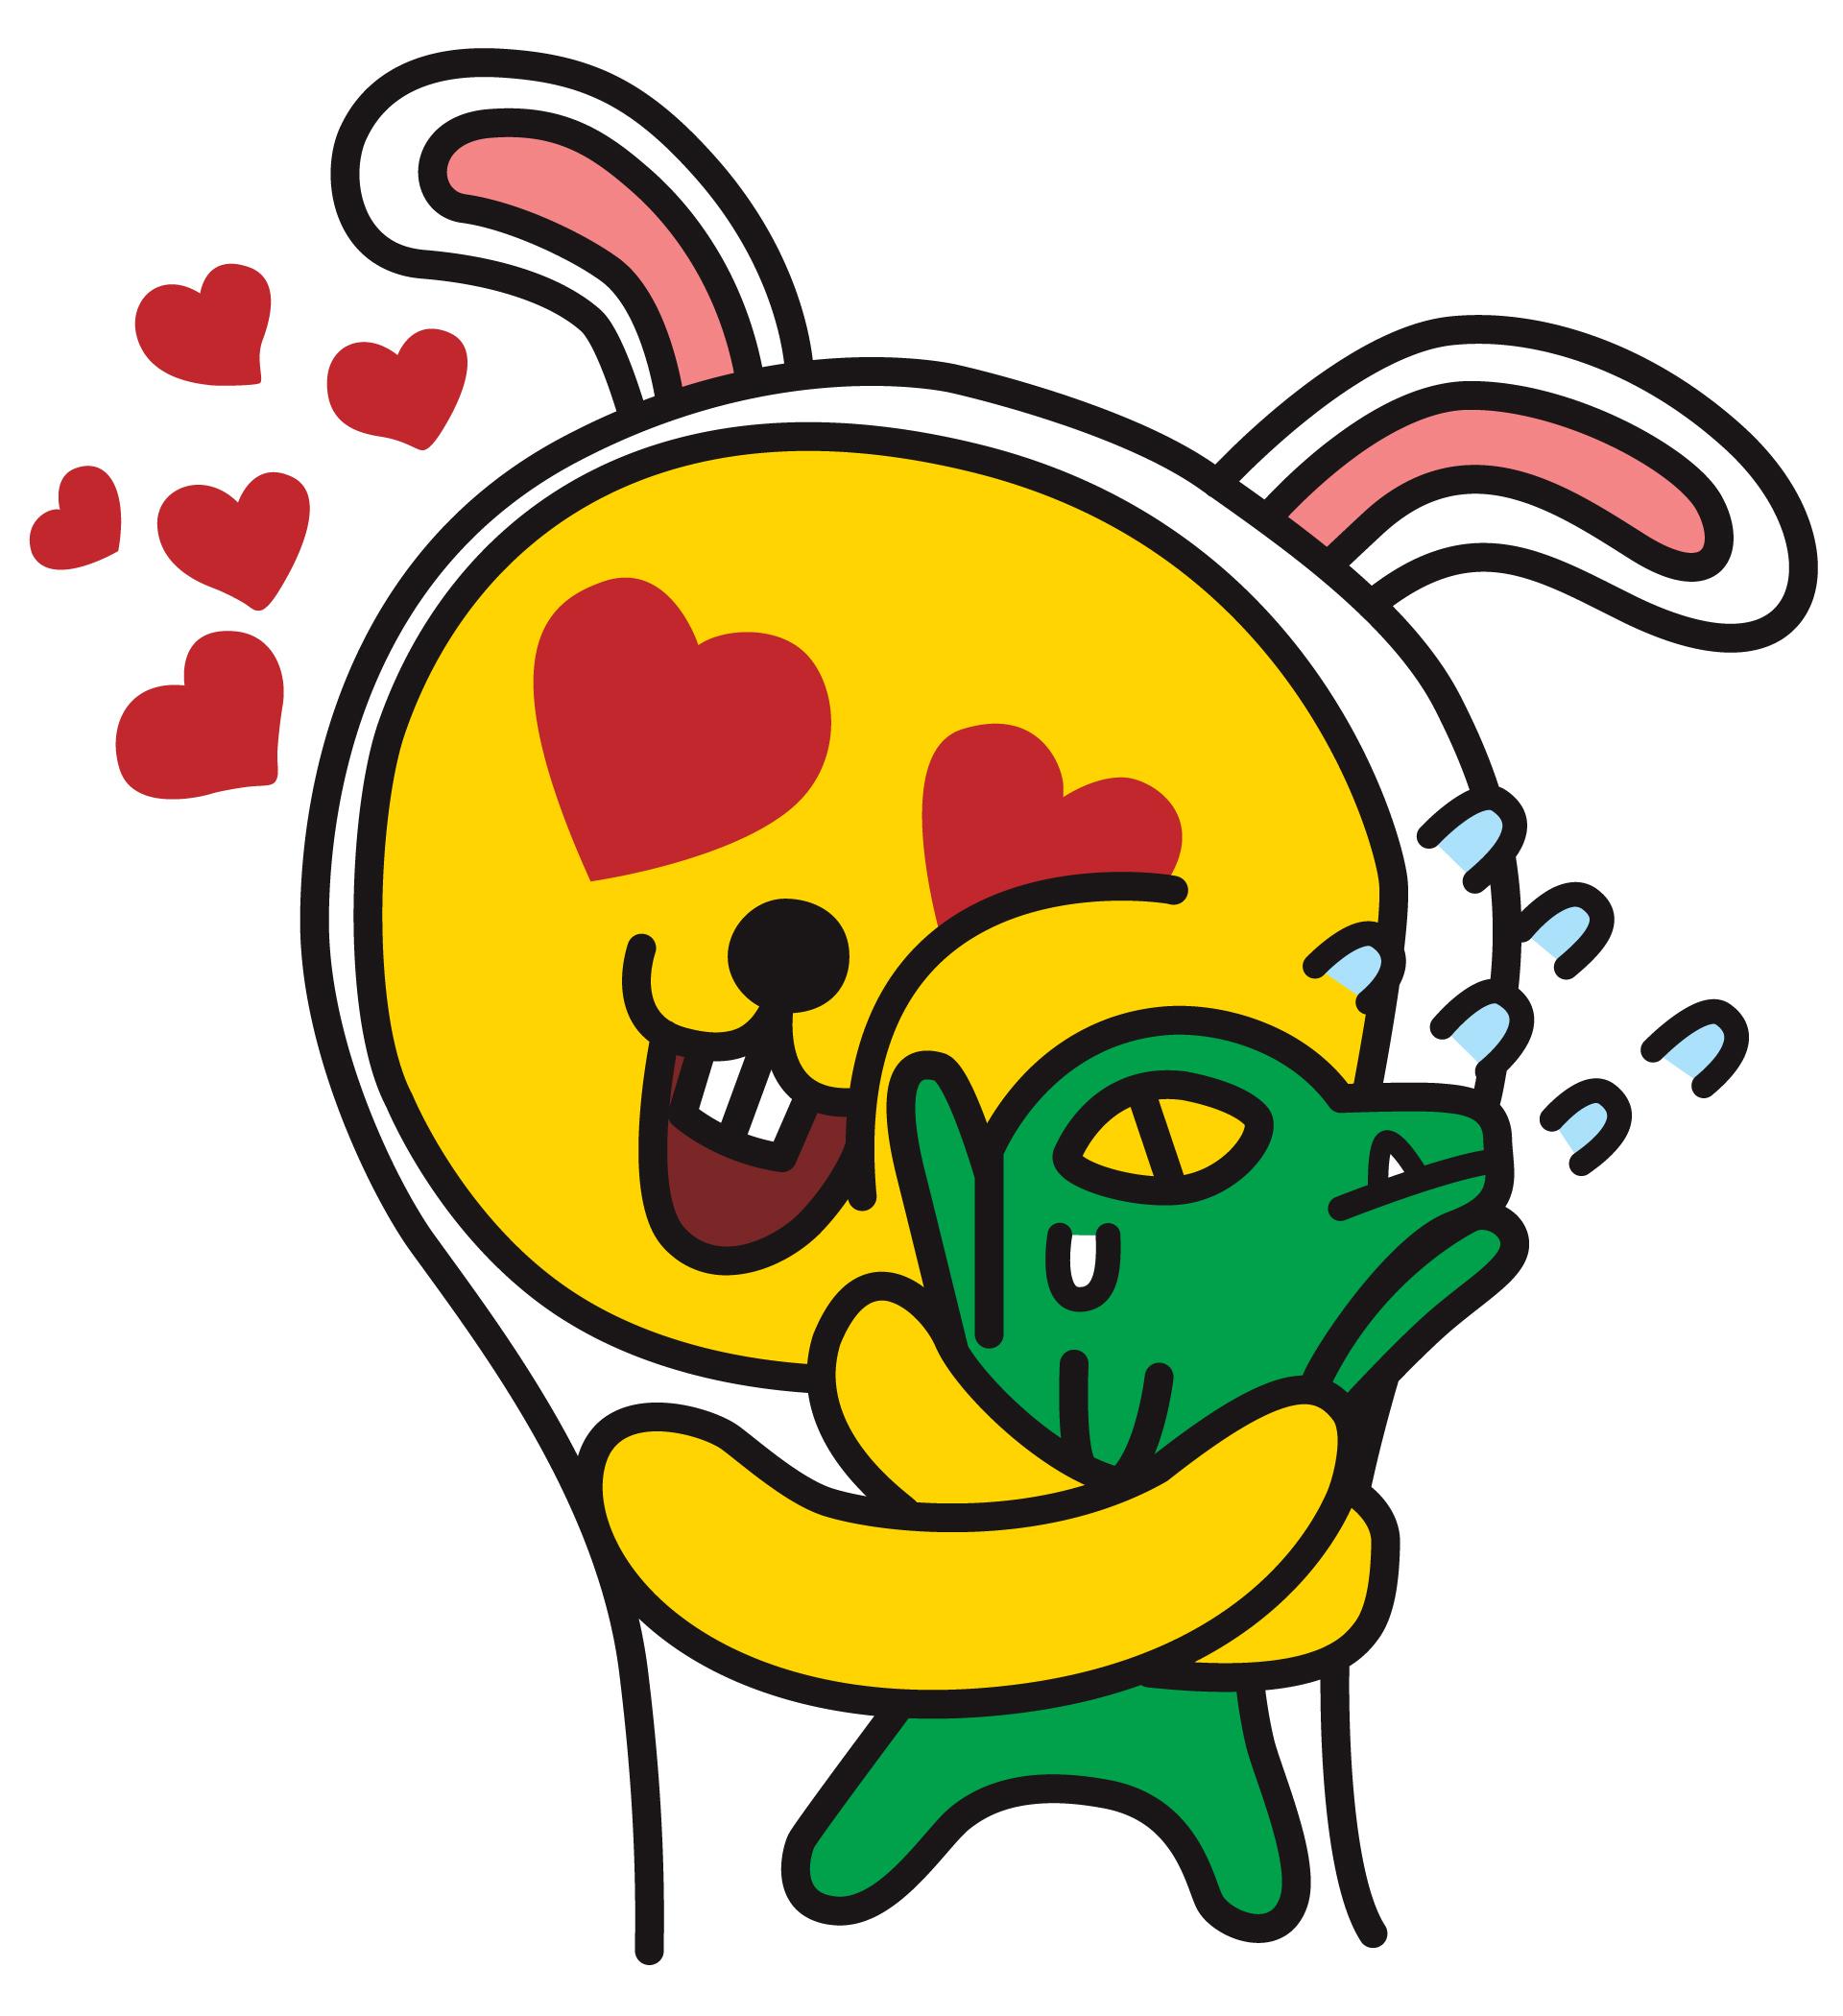 1-5_muzi_with_heart_eyes_that_hugs_con_and_rubs_it.jpg